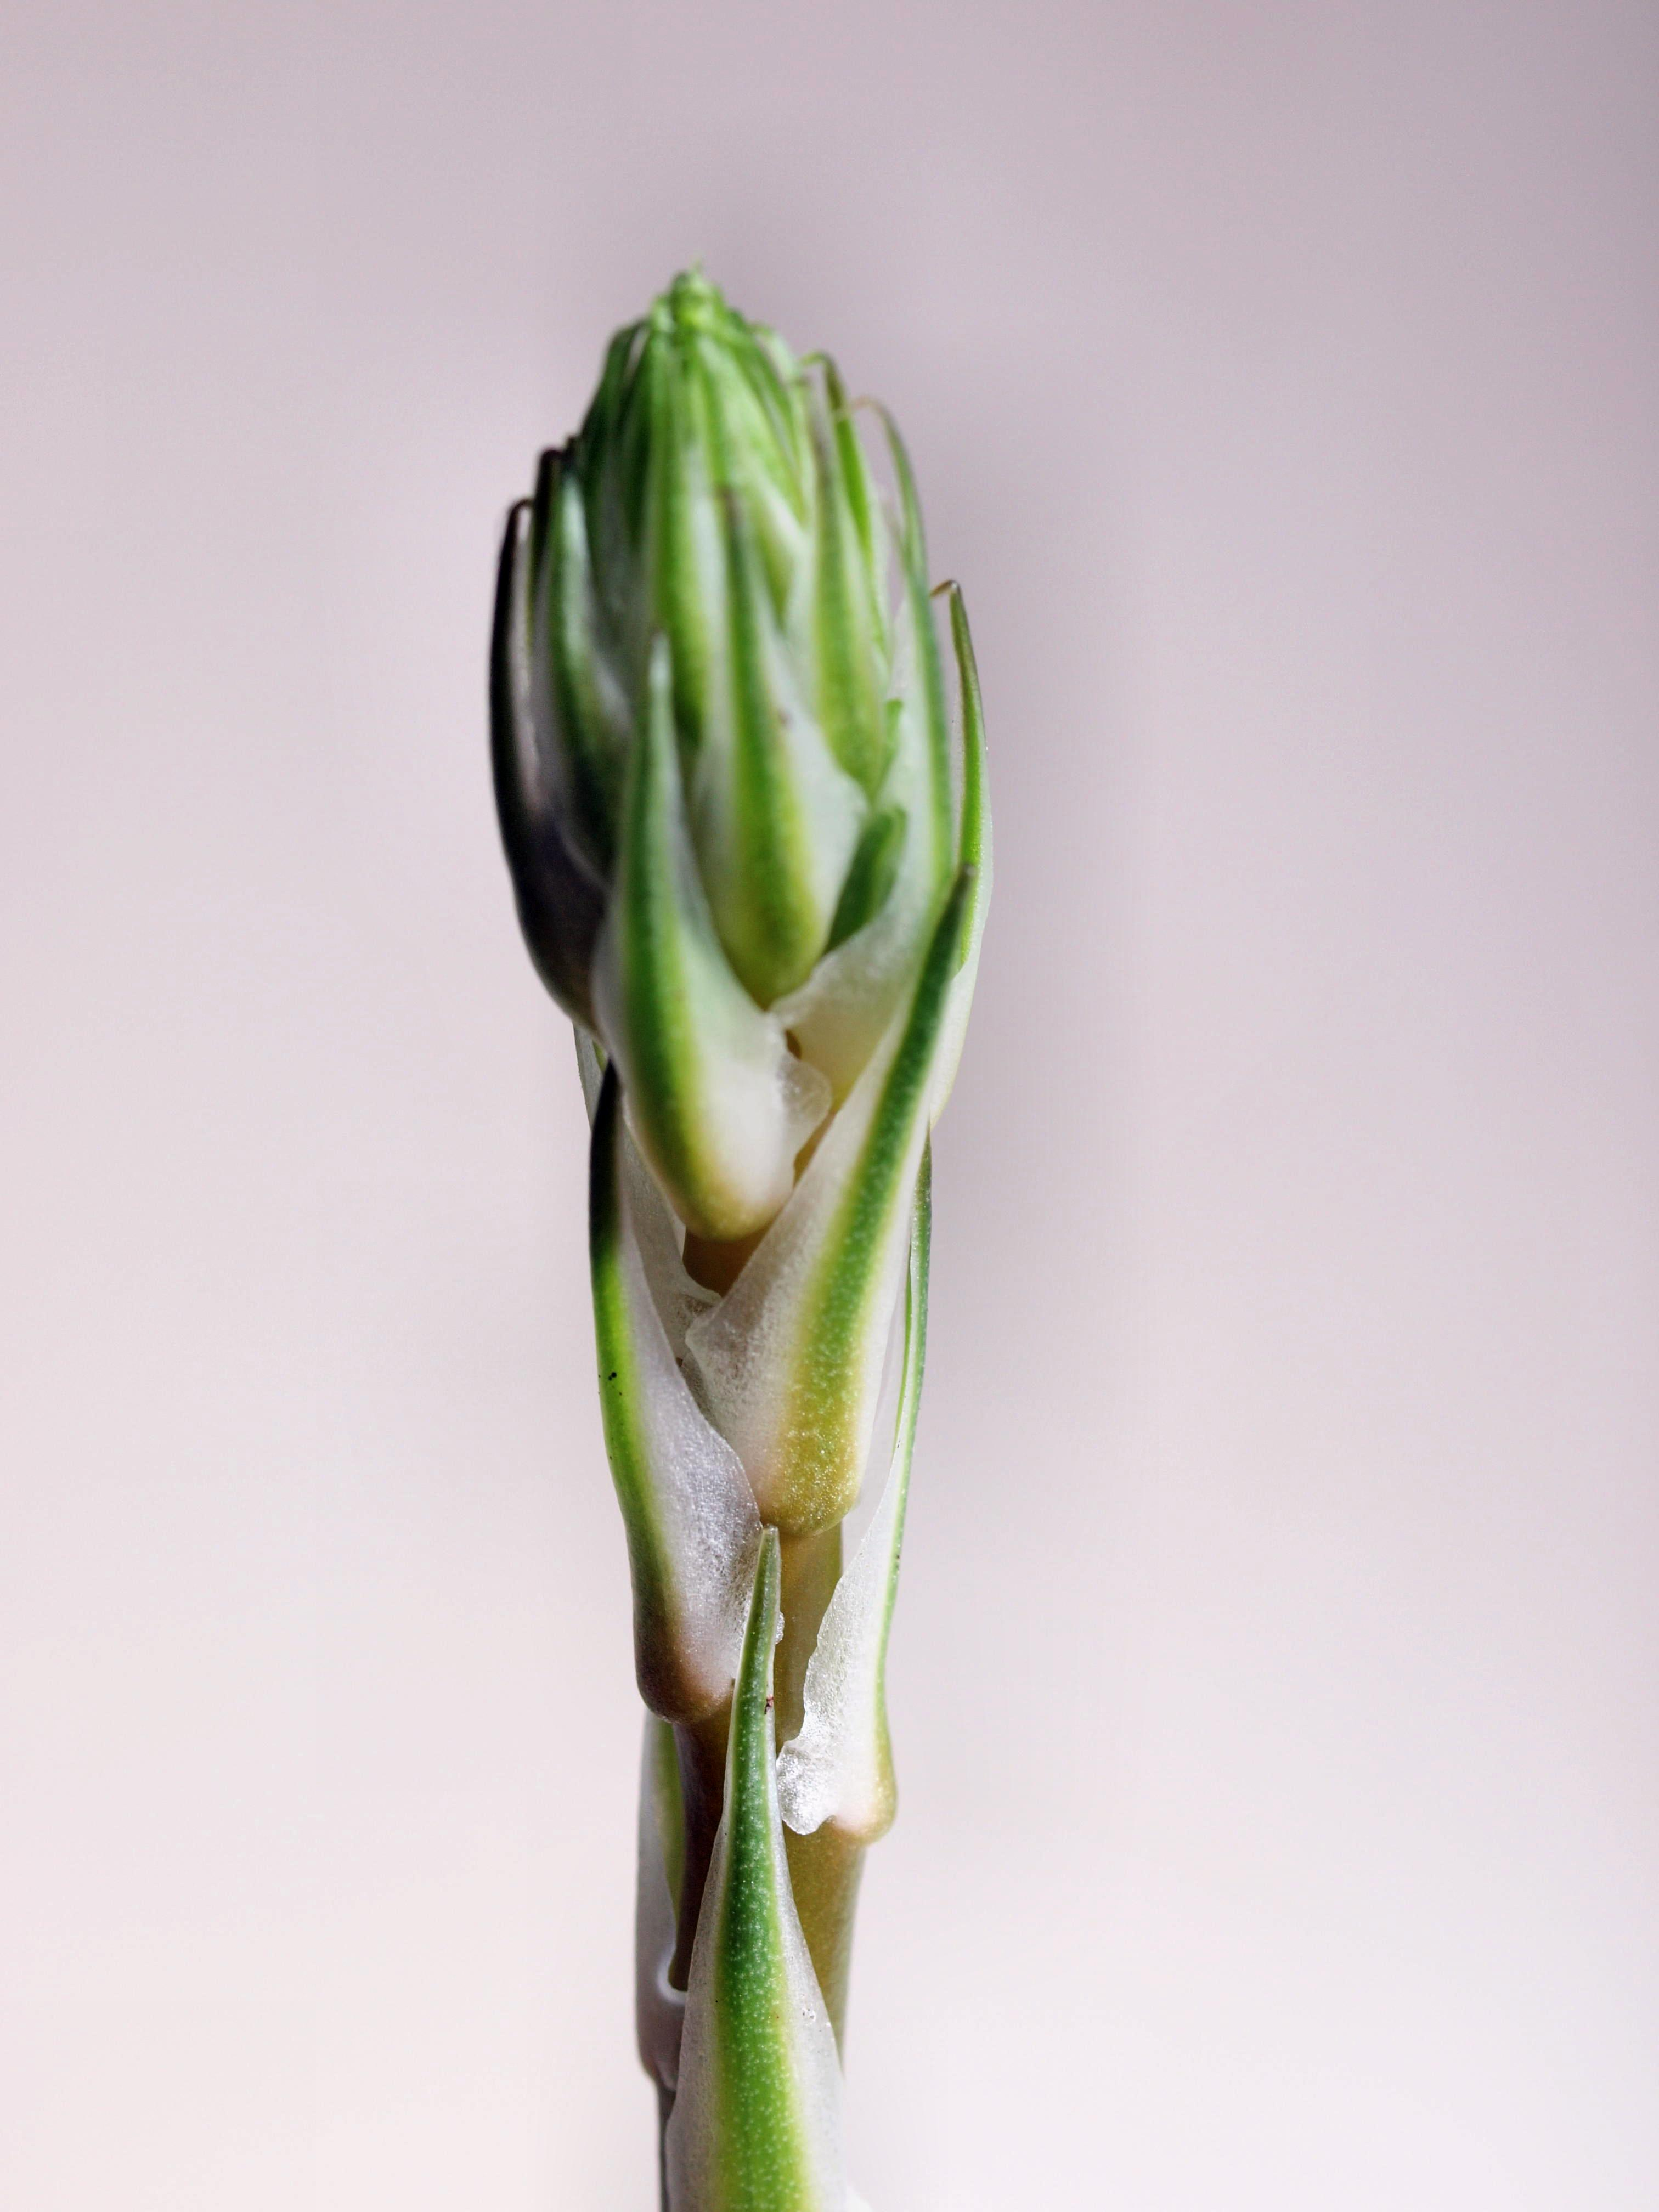 Succulent-2-3.jpeg